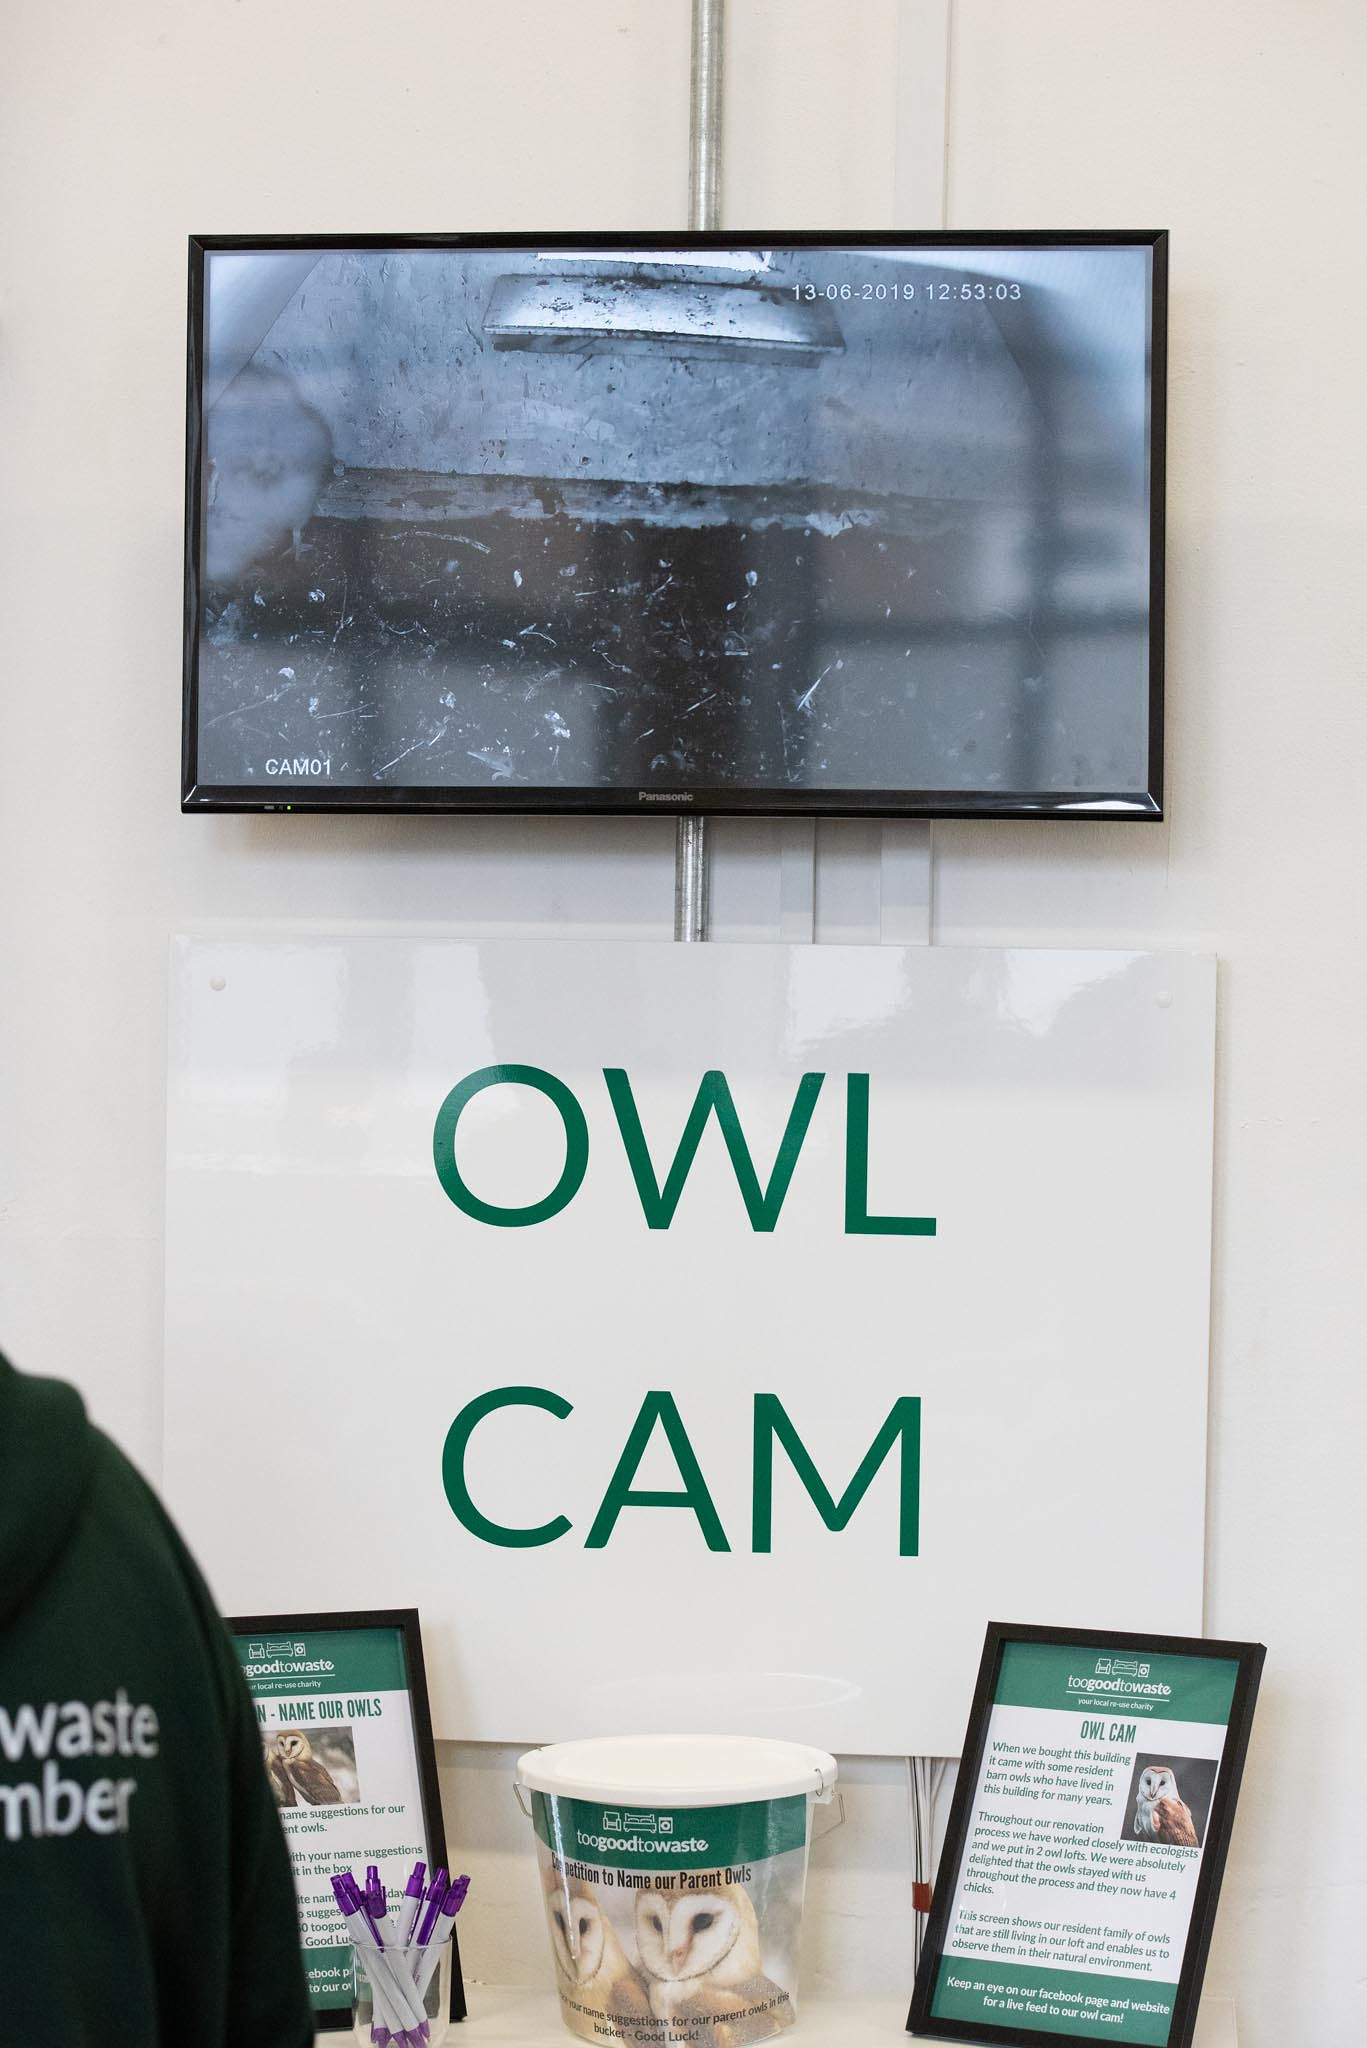 Owl cam.jpg